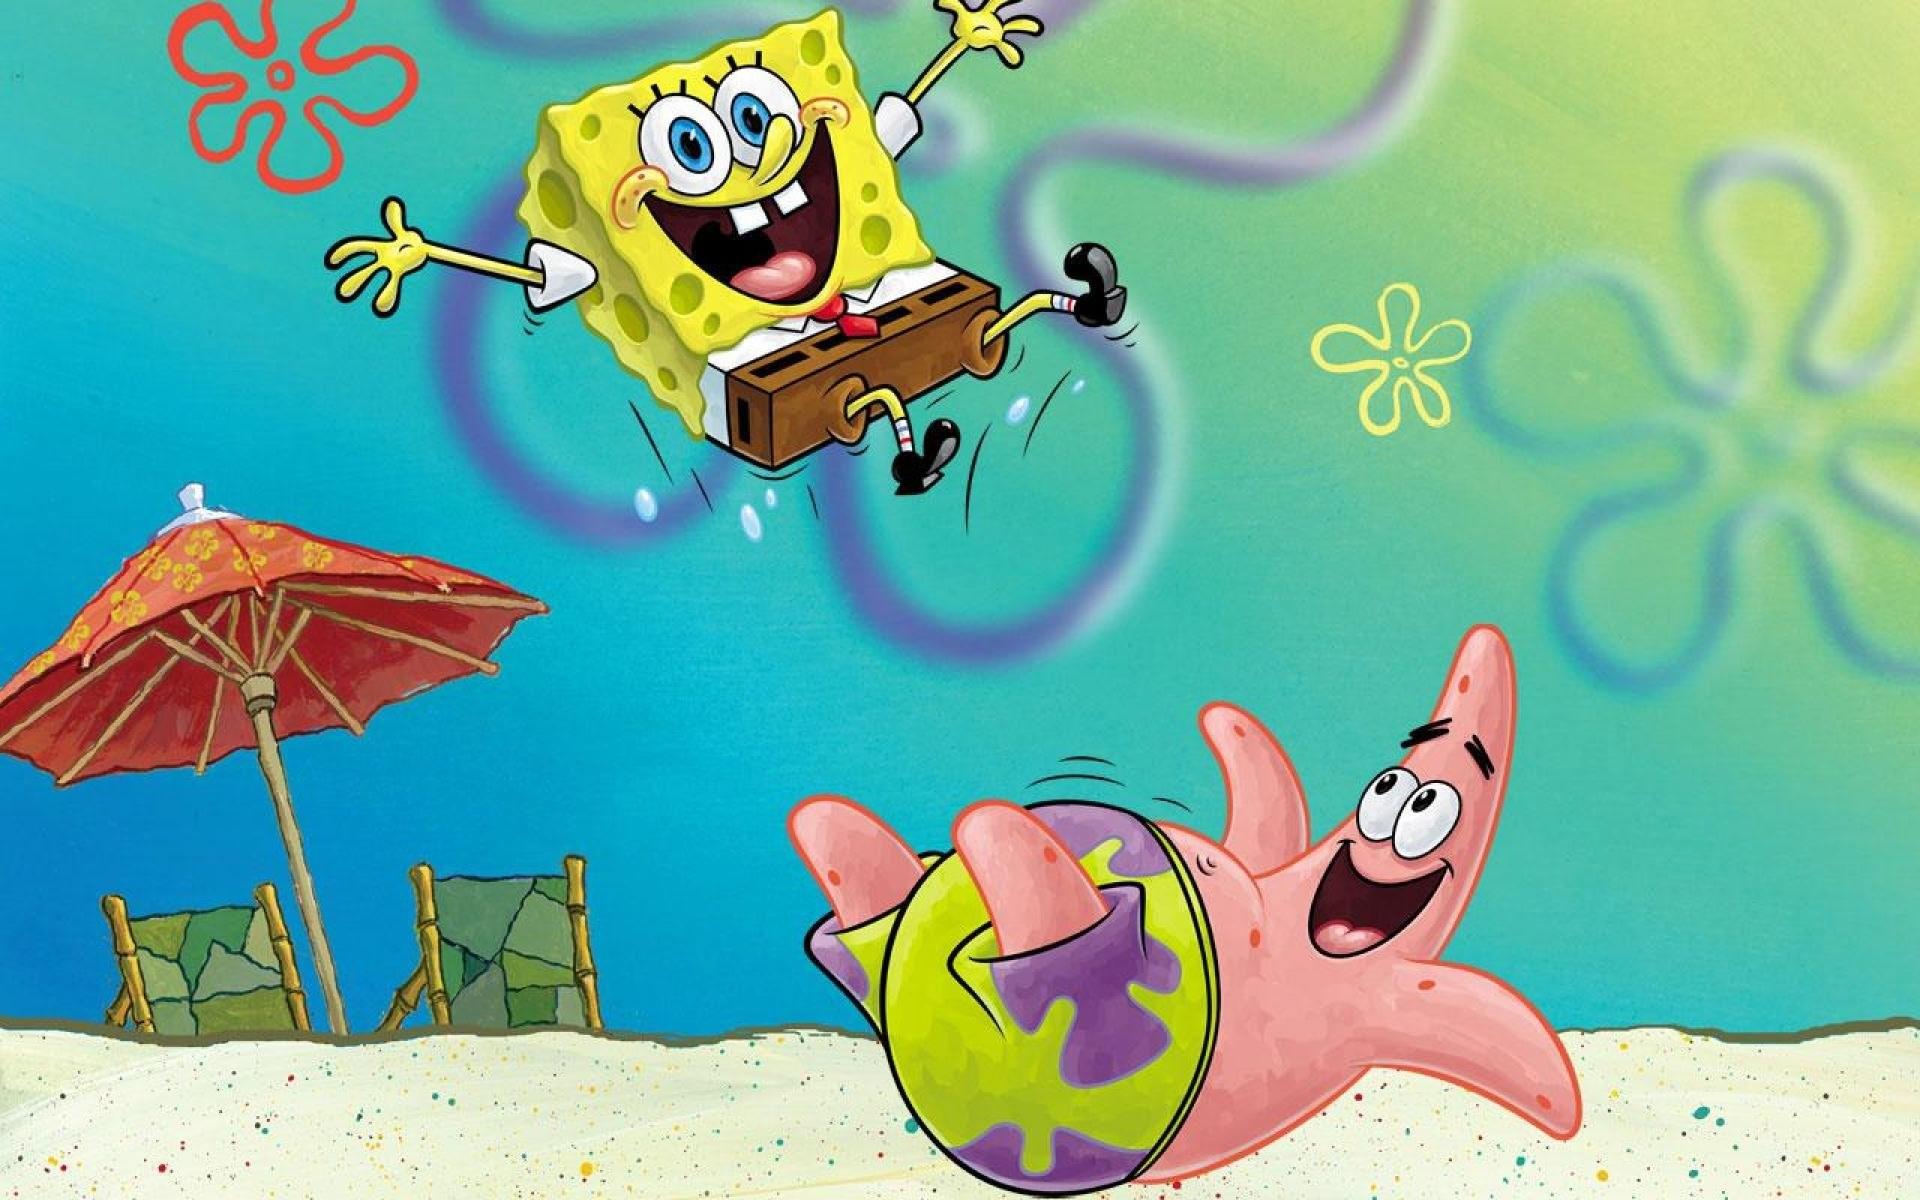 Spongebob Flower Sky Background ·①